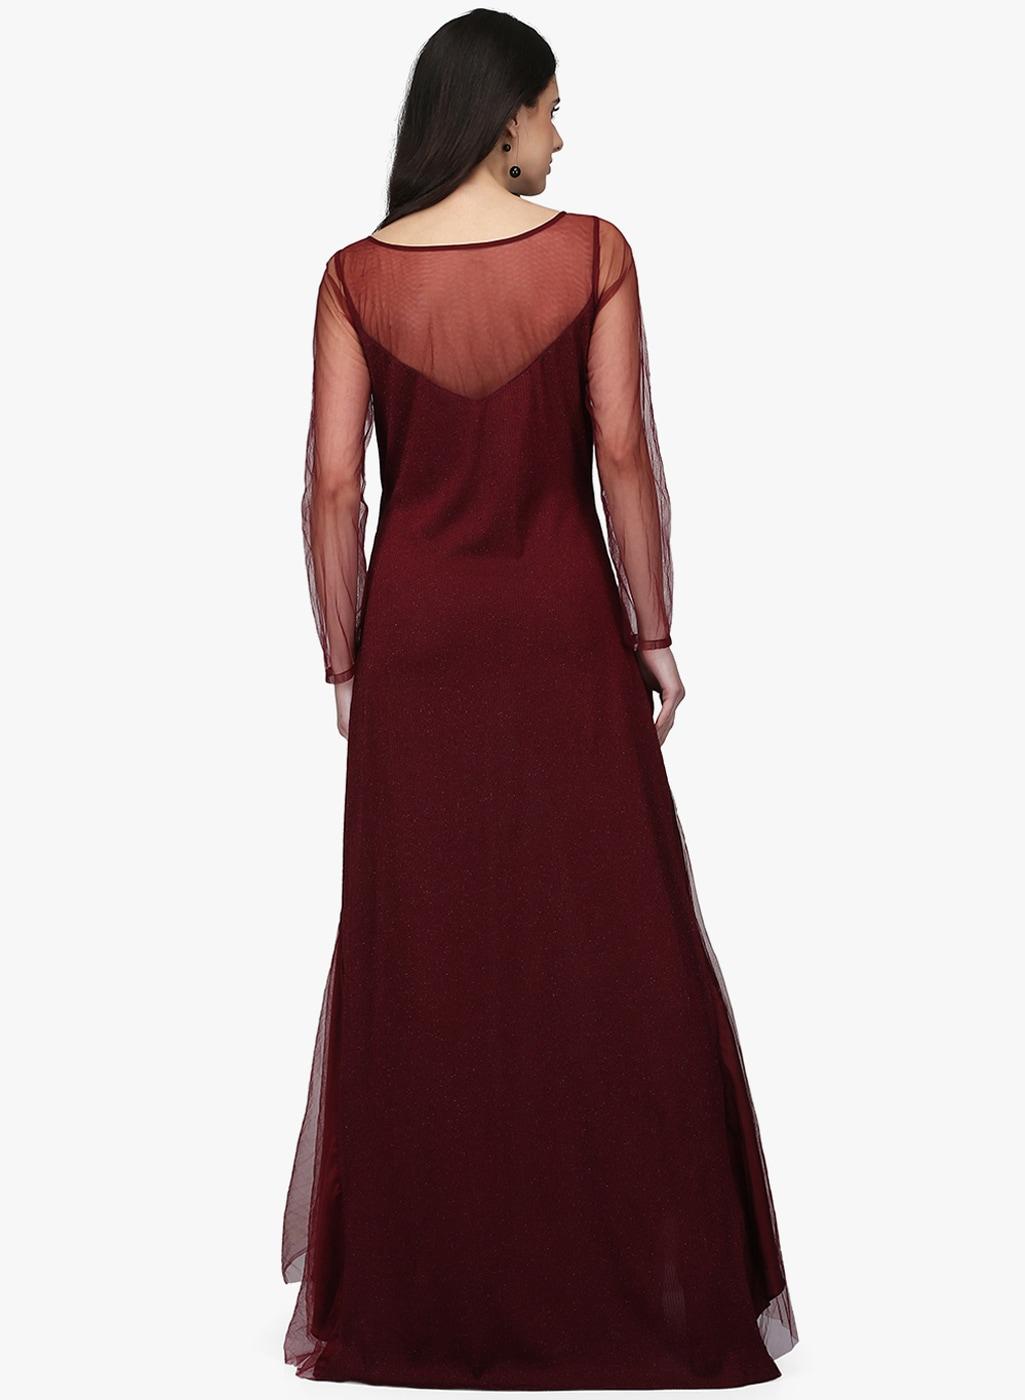 9d55eb21857a1 Eavan Dresses - Buy Eavan Dresses Online in India - Jabong